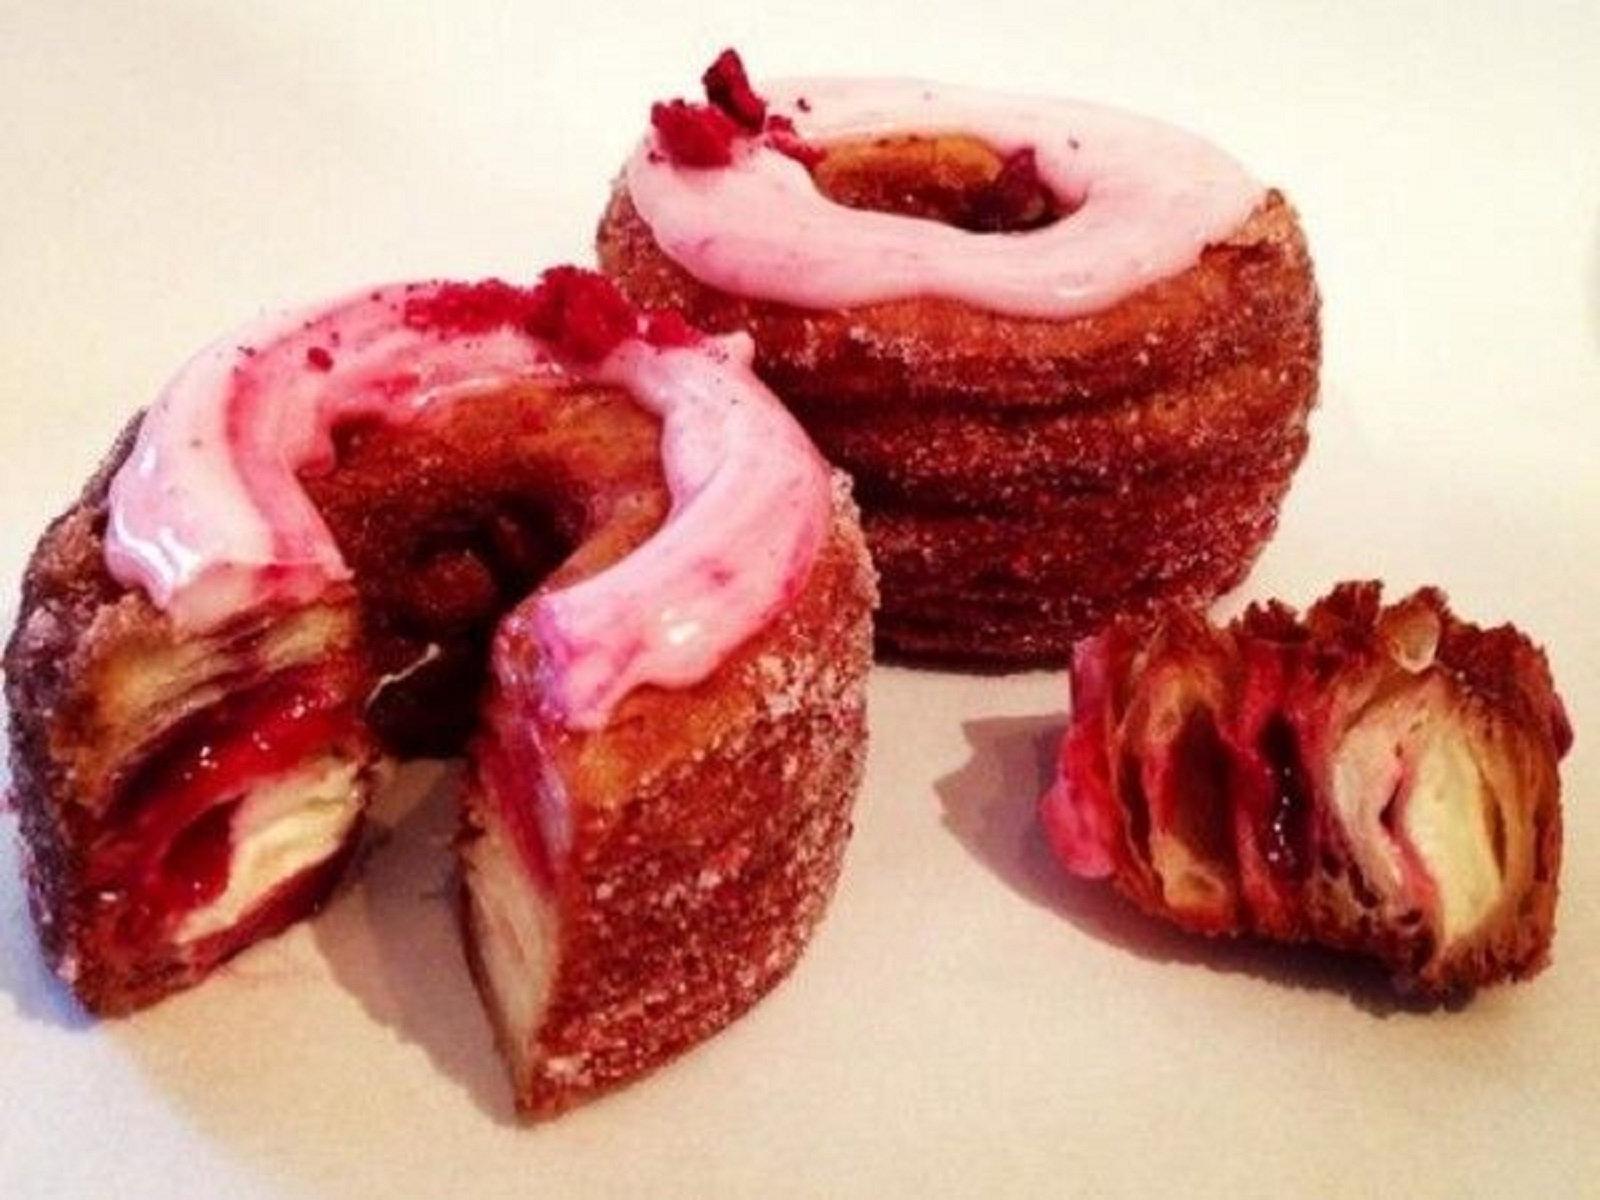 Donuts/Beignets/Cronuts/Churros/Zeppoli